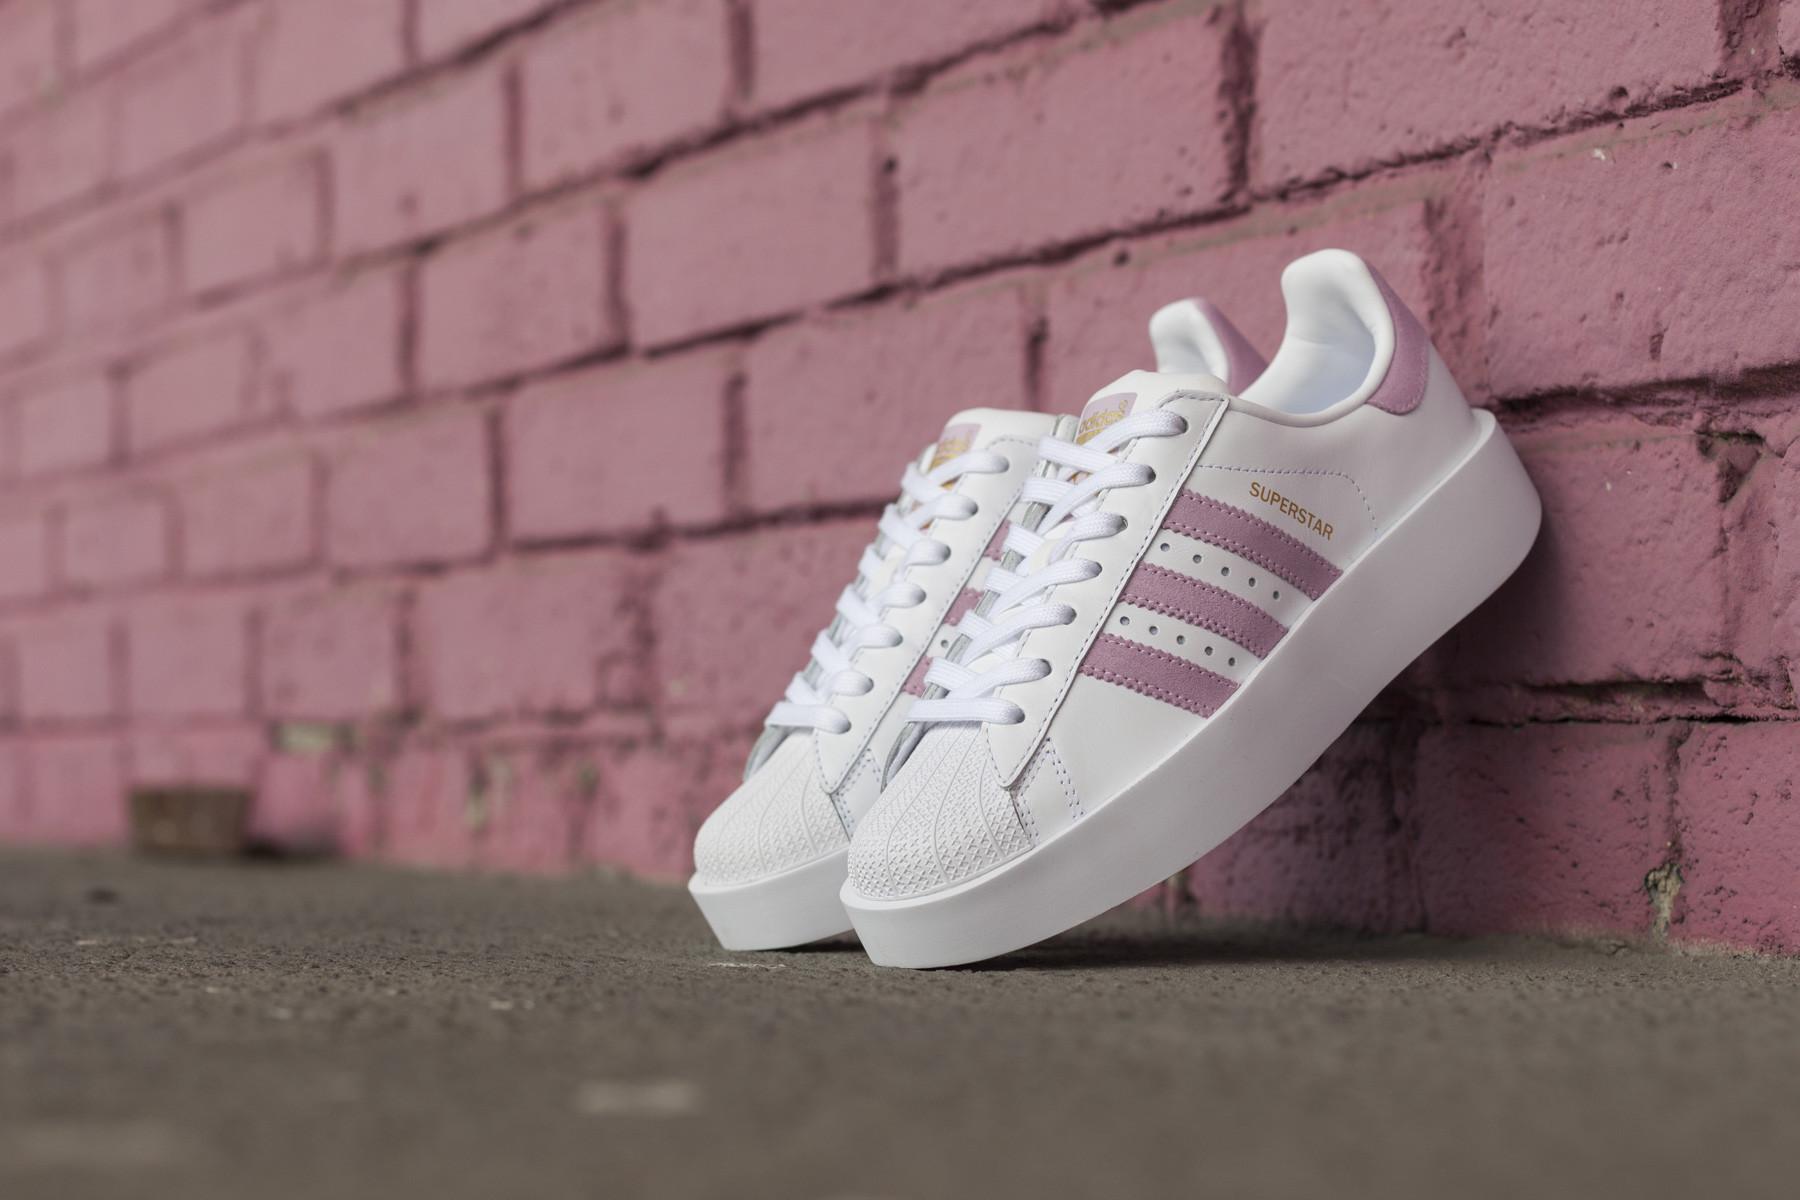 W Adidas Superstar Bold Sneaker.no